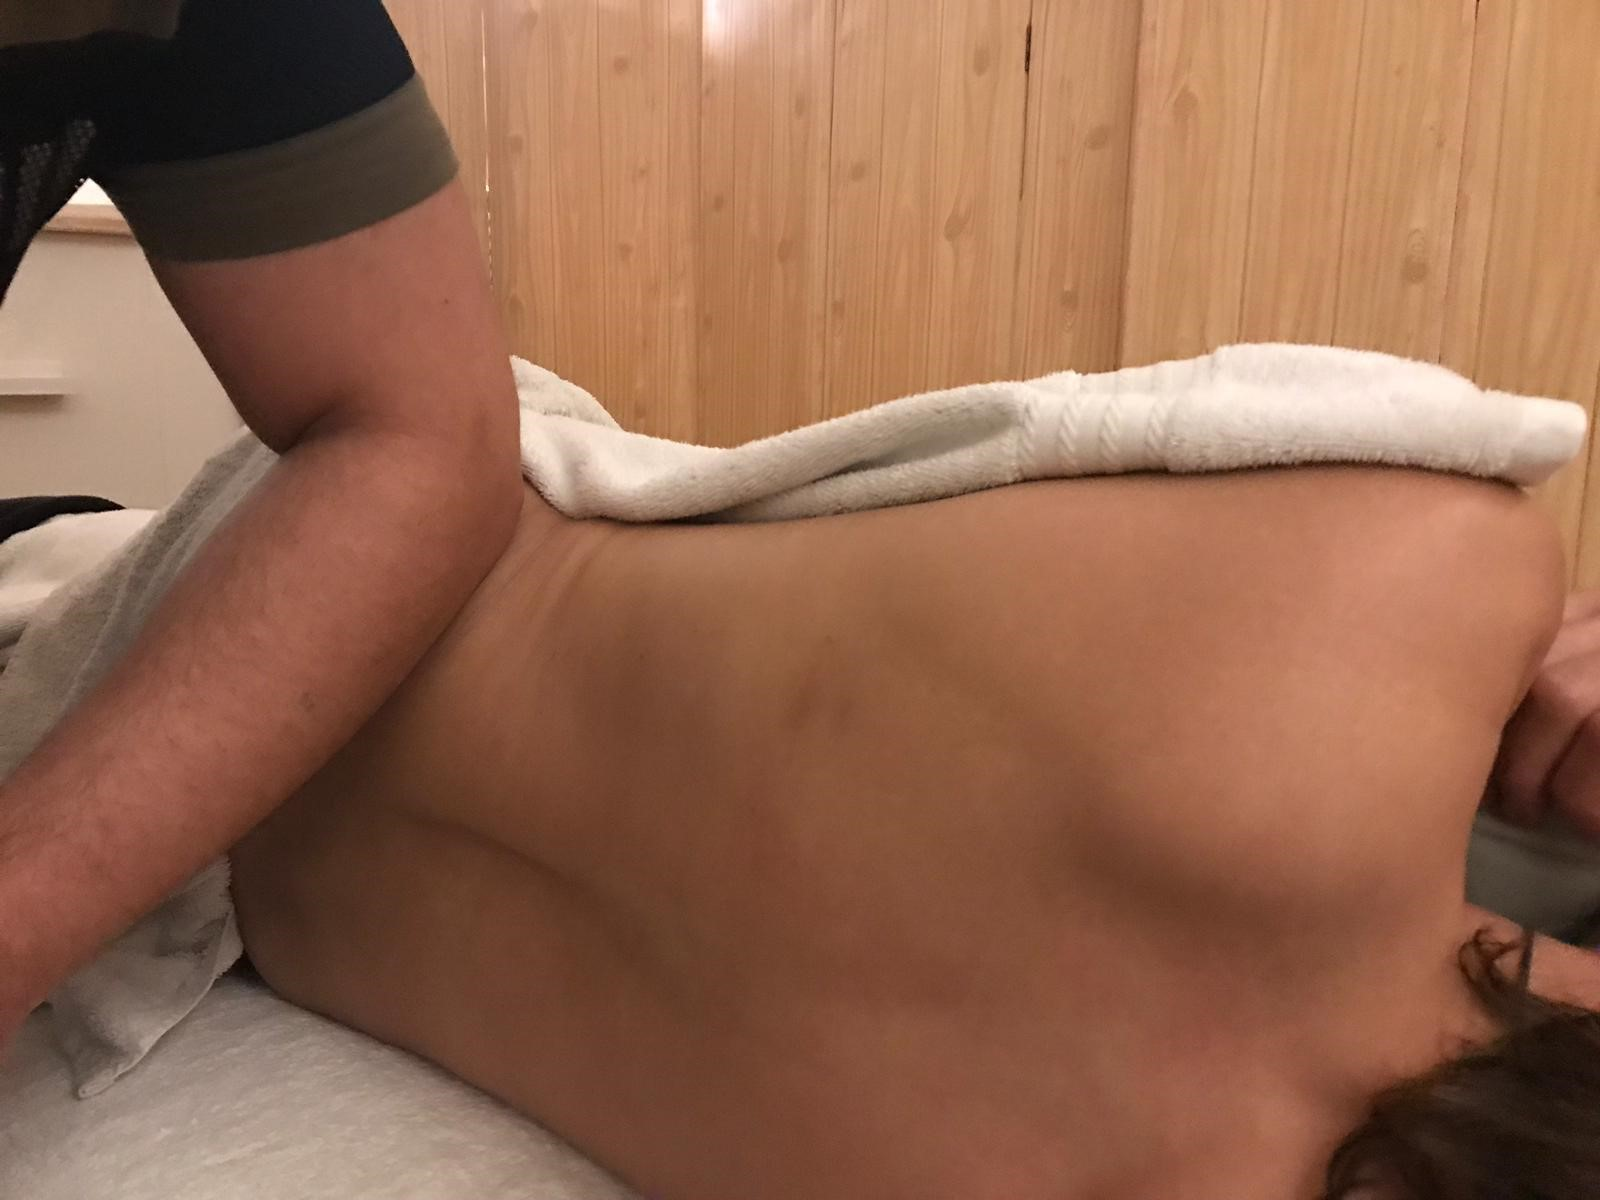 ontspannings massage bij Losjes massage Utrecht